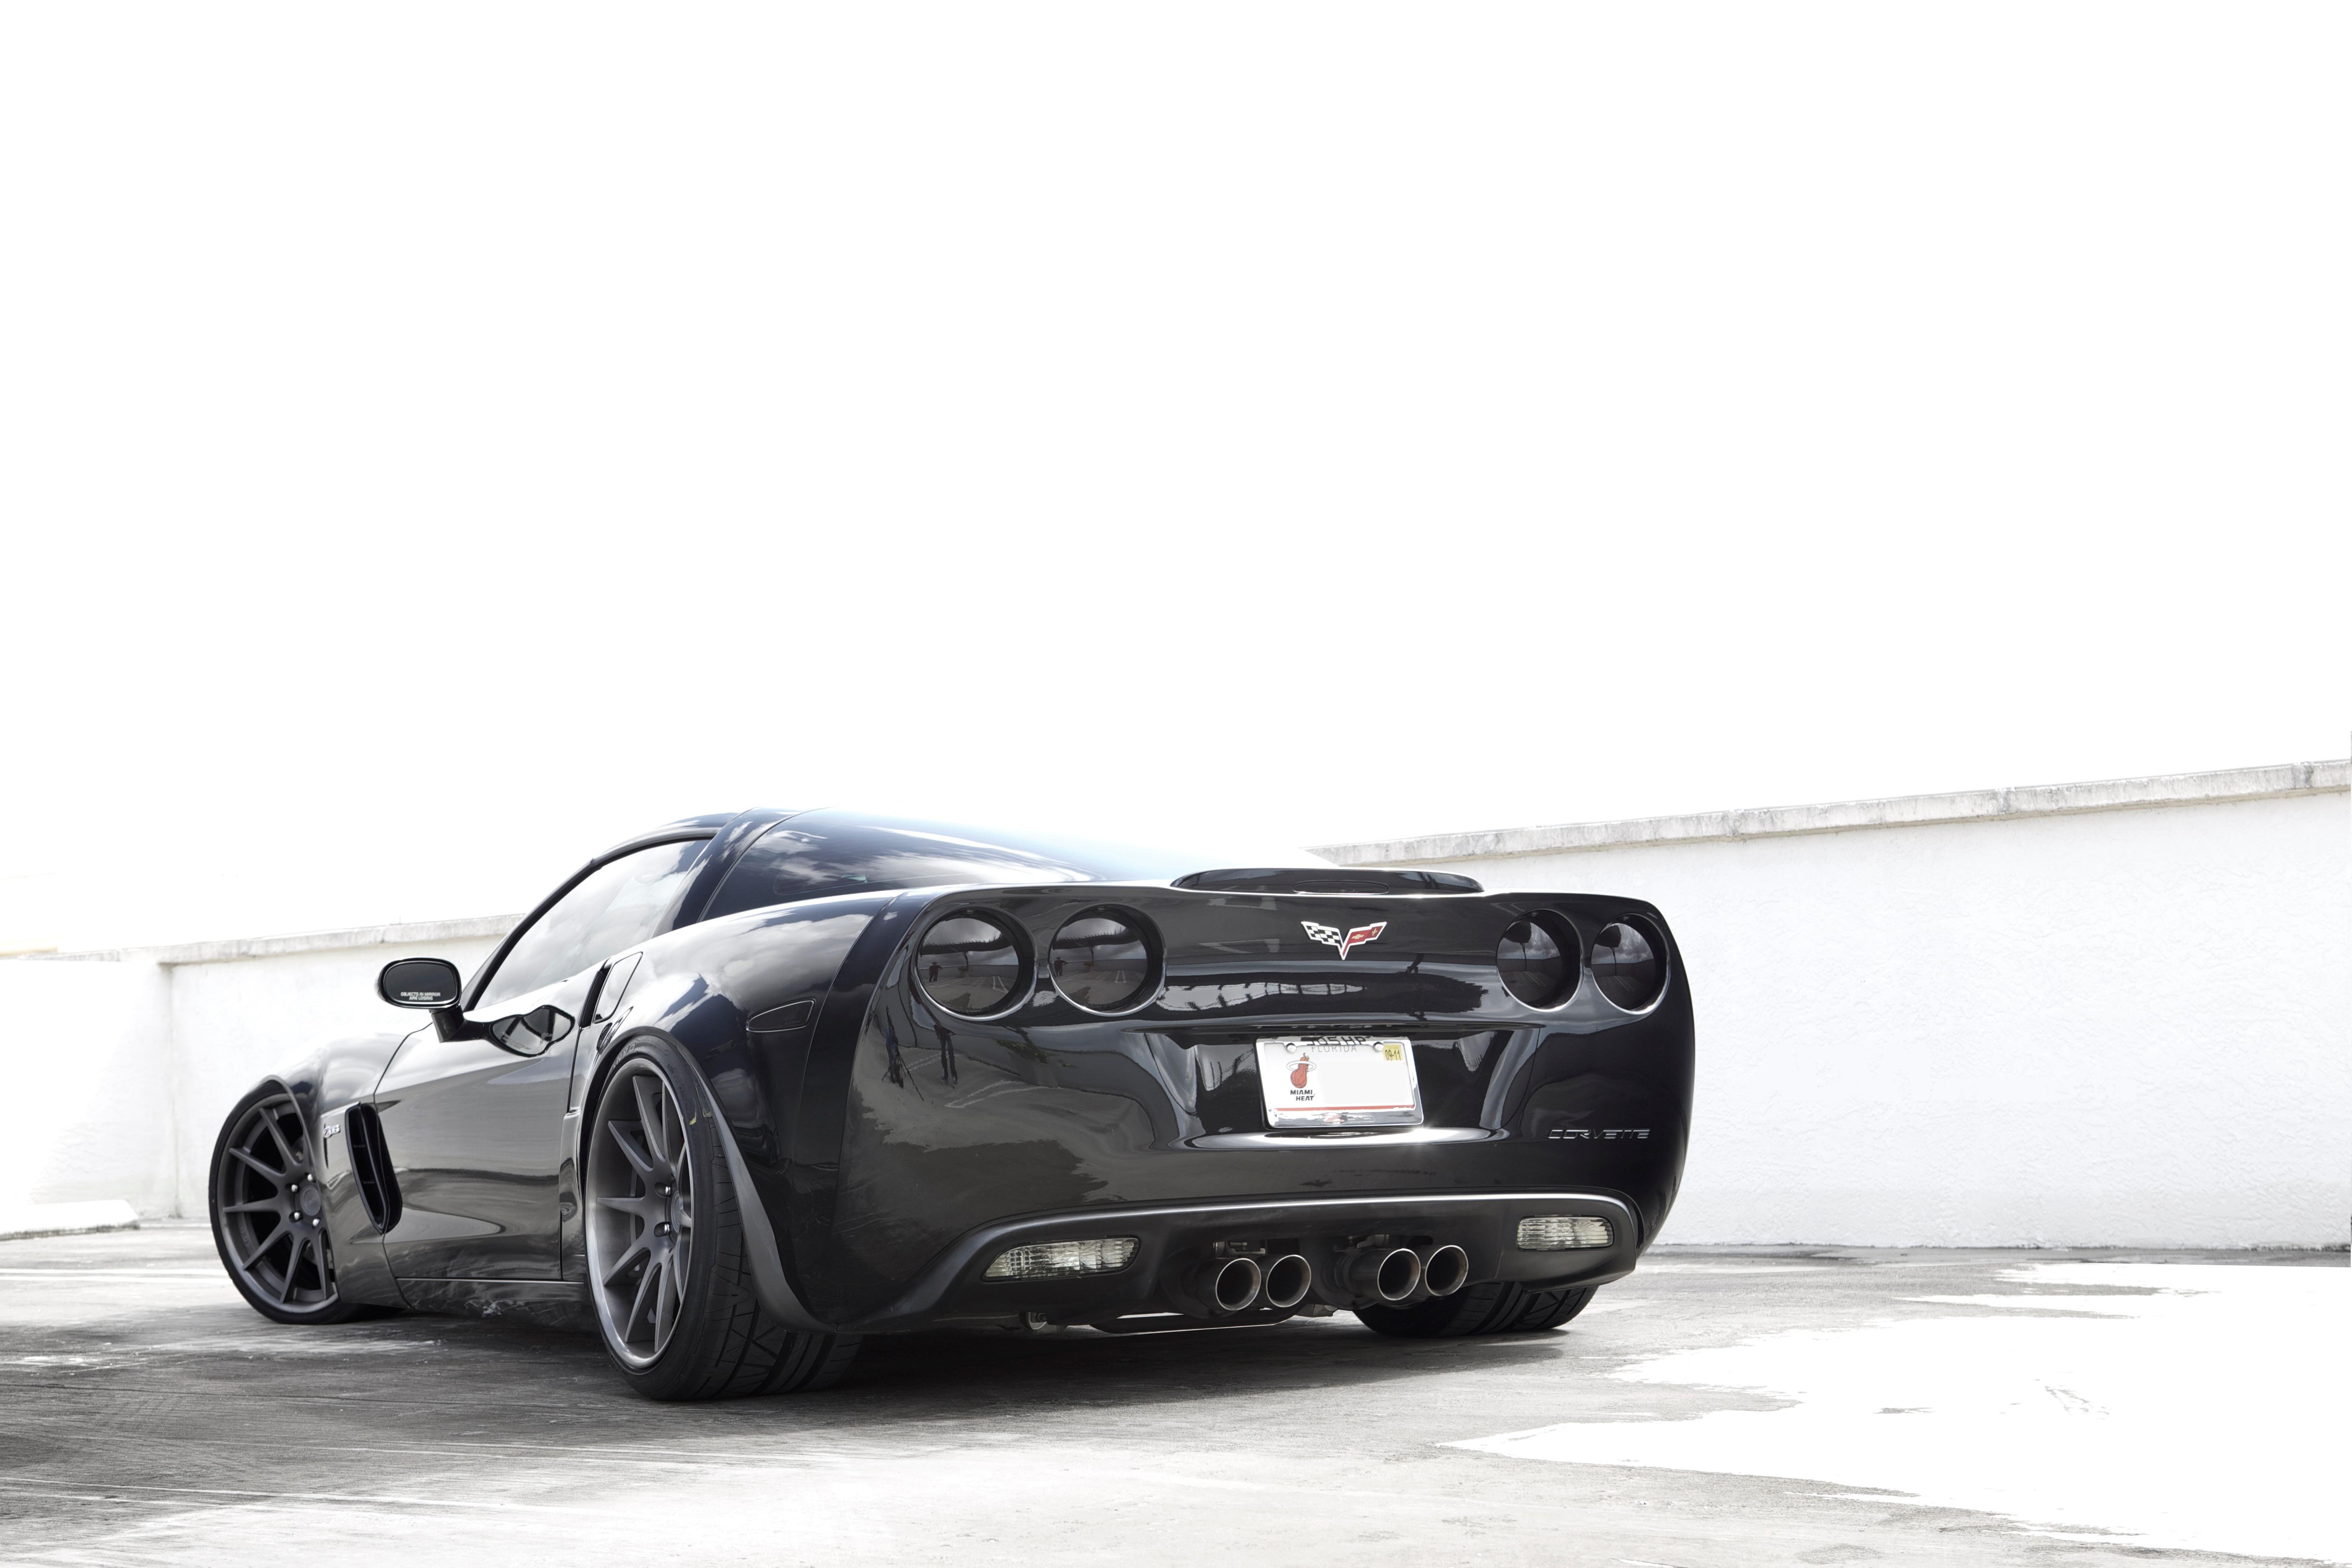 Wallpaper : hood, sports car, Corvette, Chevrolet, performance car